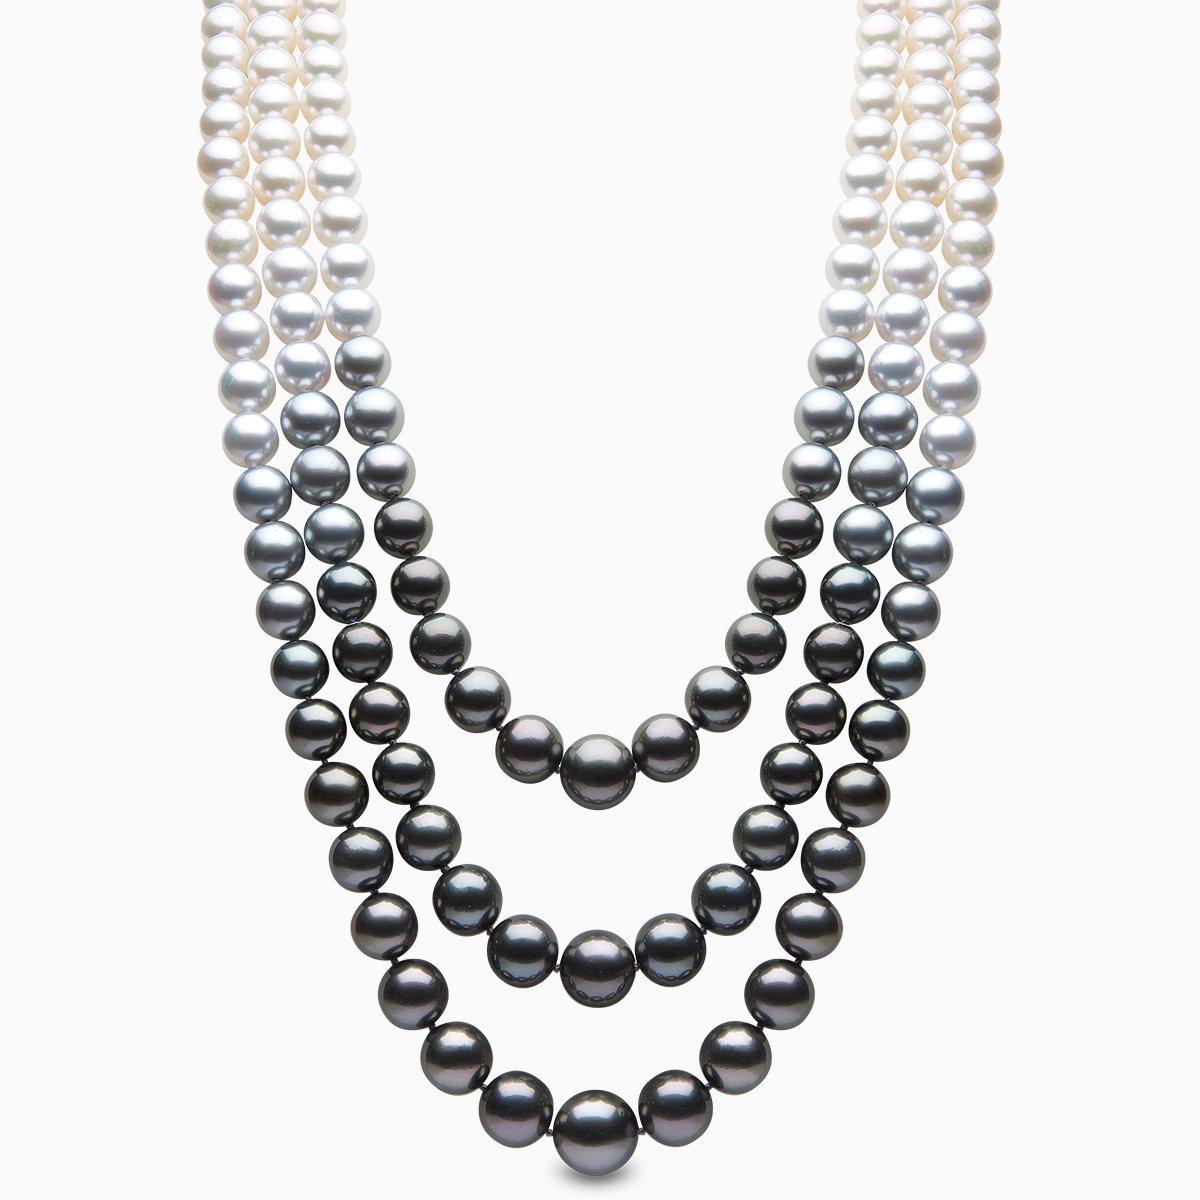 Yoko London Ombré Necklace